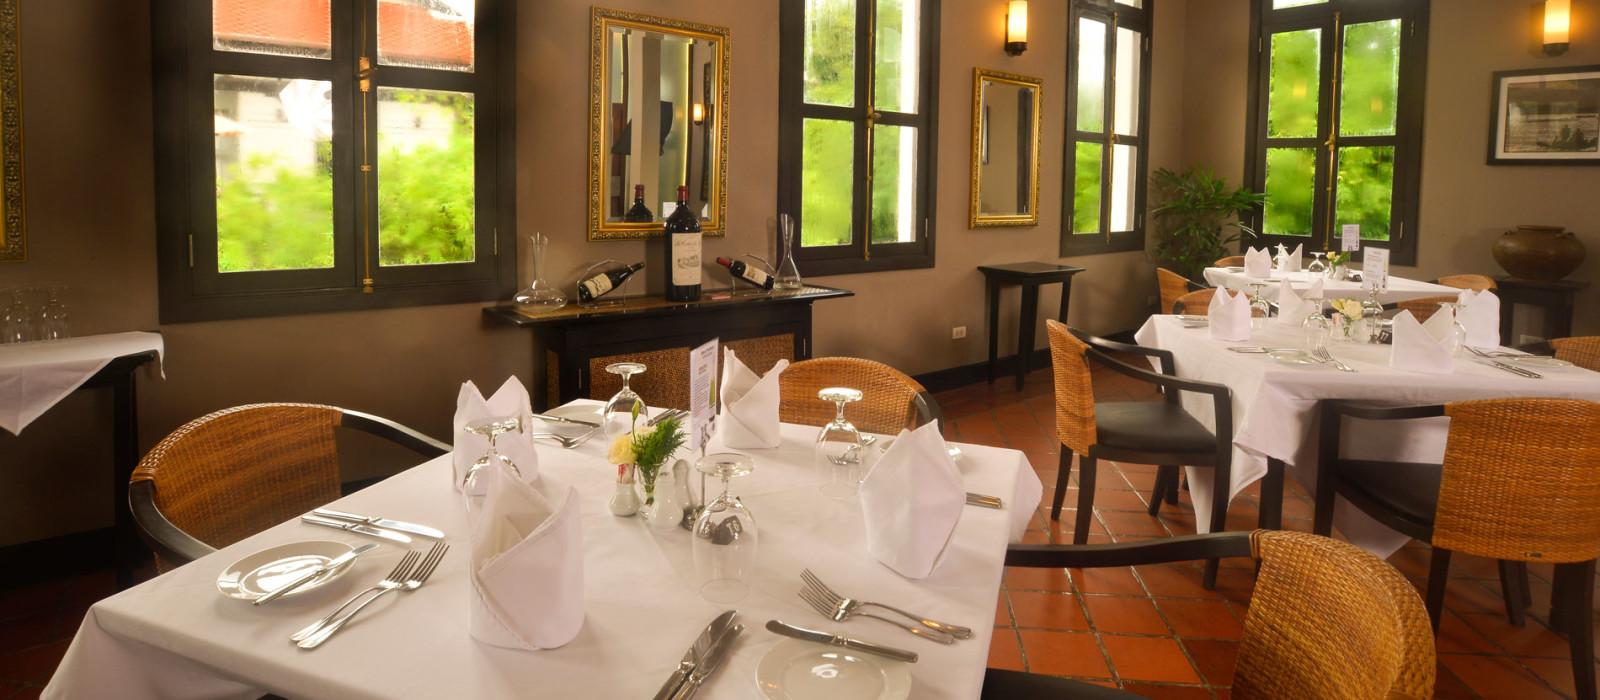 Hotel Ansara  Laos